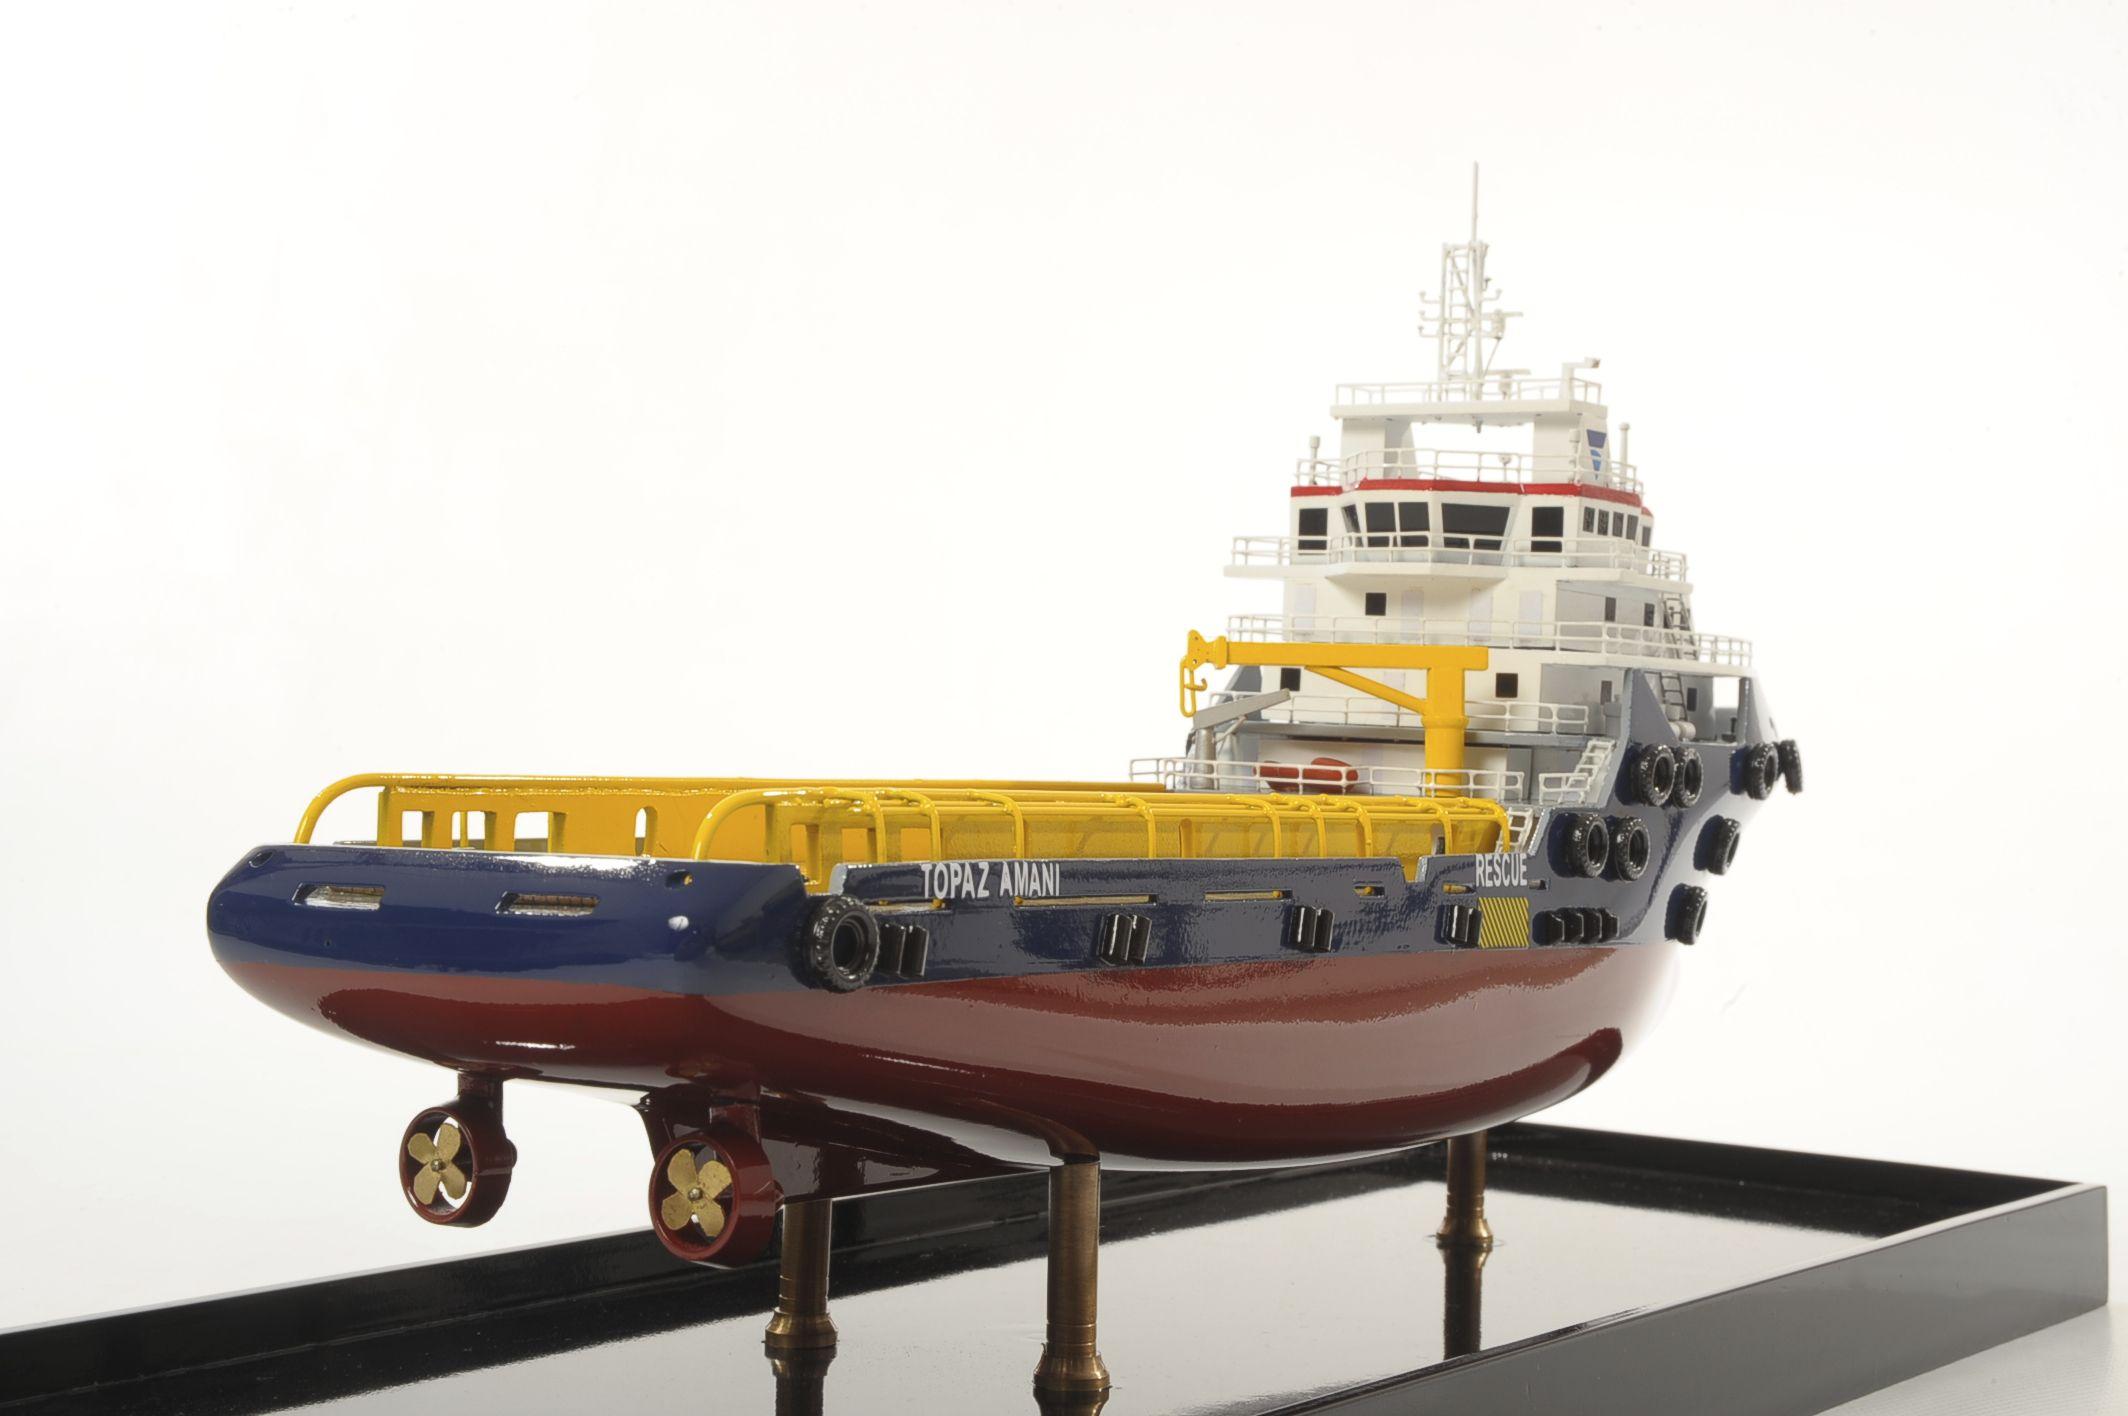 1515-8937-Topaz-Marine-Supply-Vessel-Model-ship